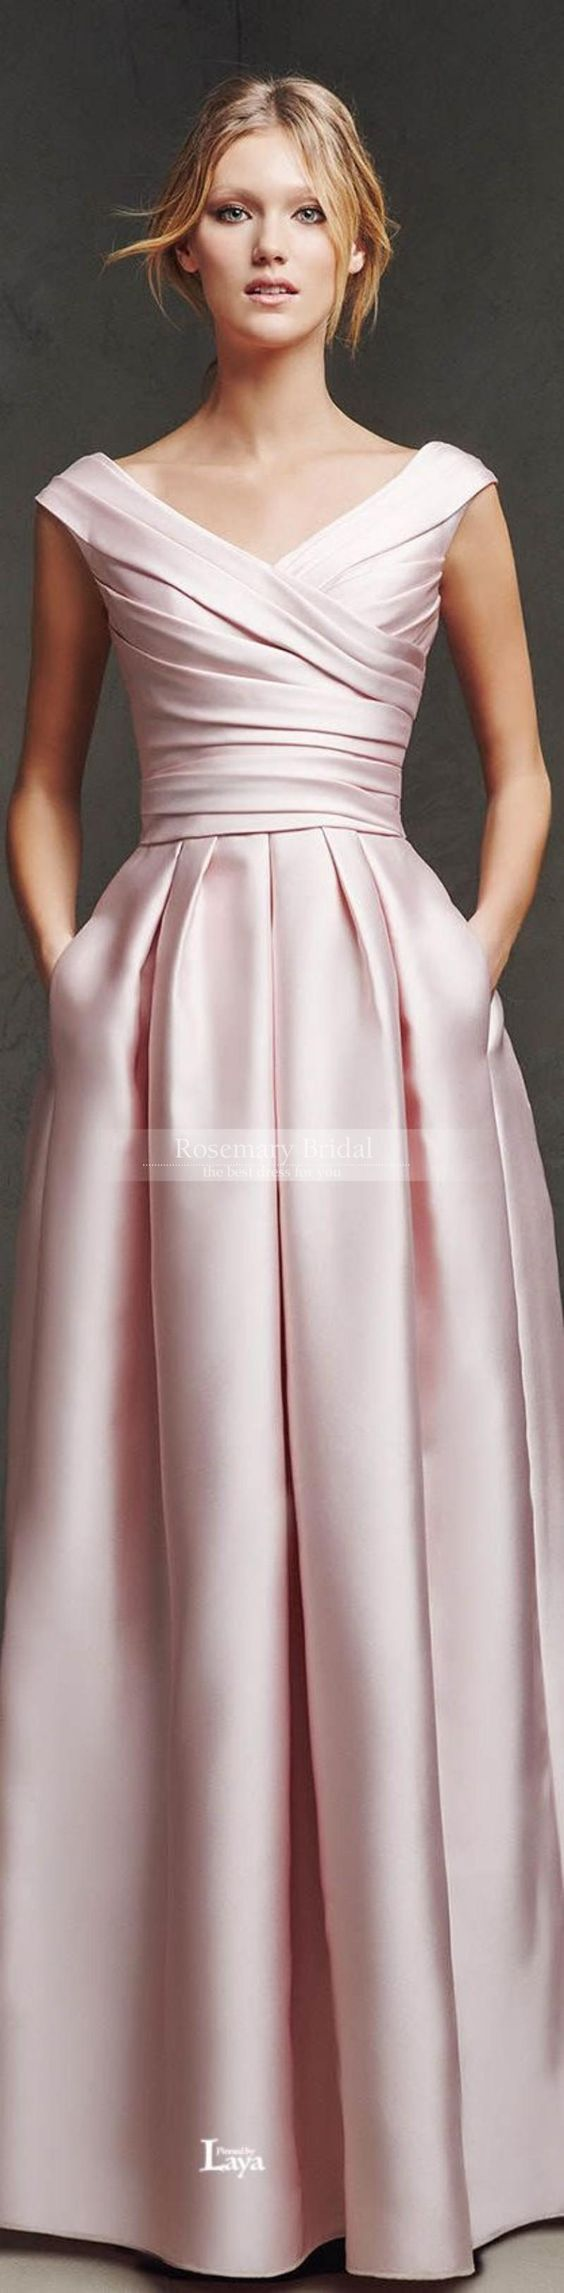 Royal blue wedding dresses plus size  Elegant Winter  Pleats A Line V Neck Cap Sleeve Long Floor